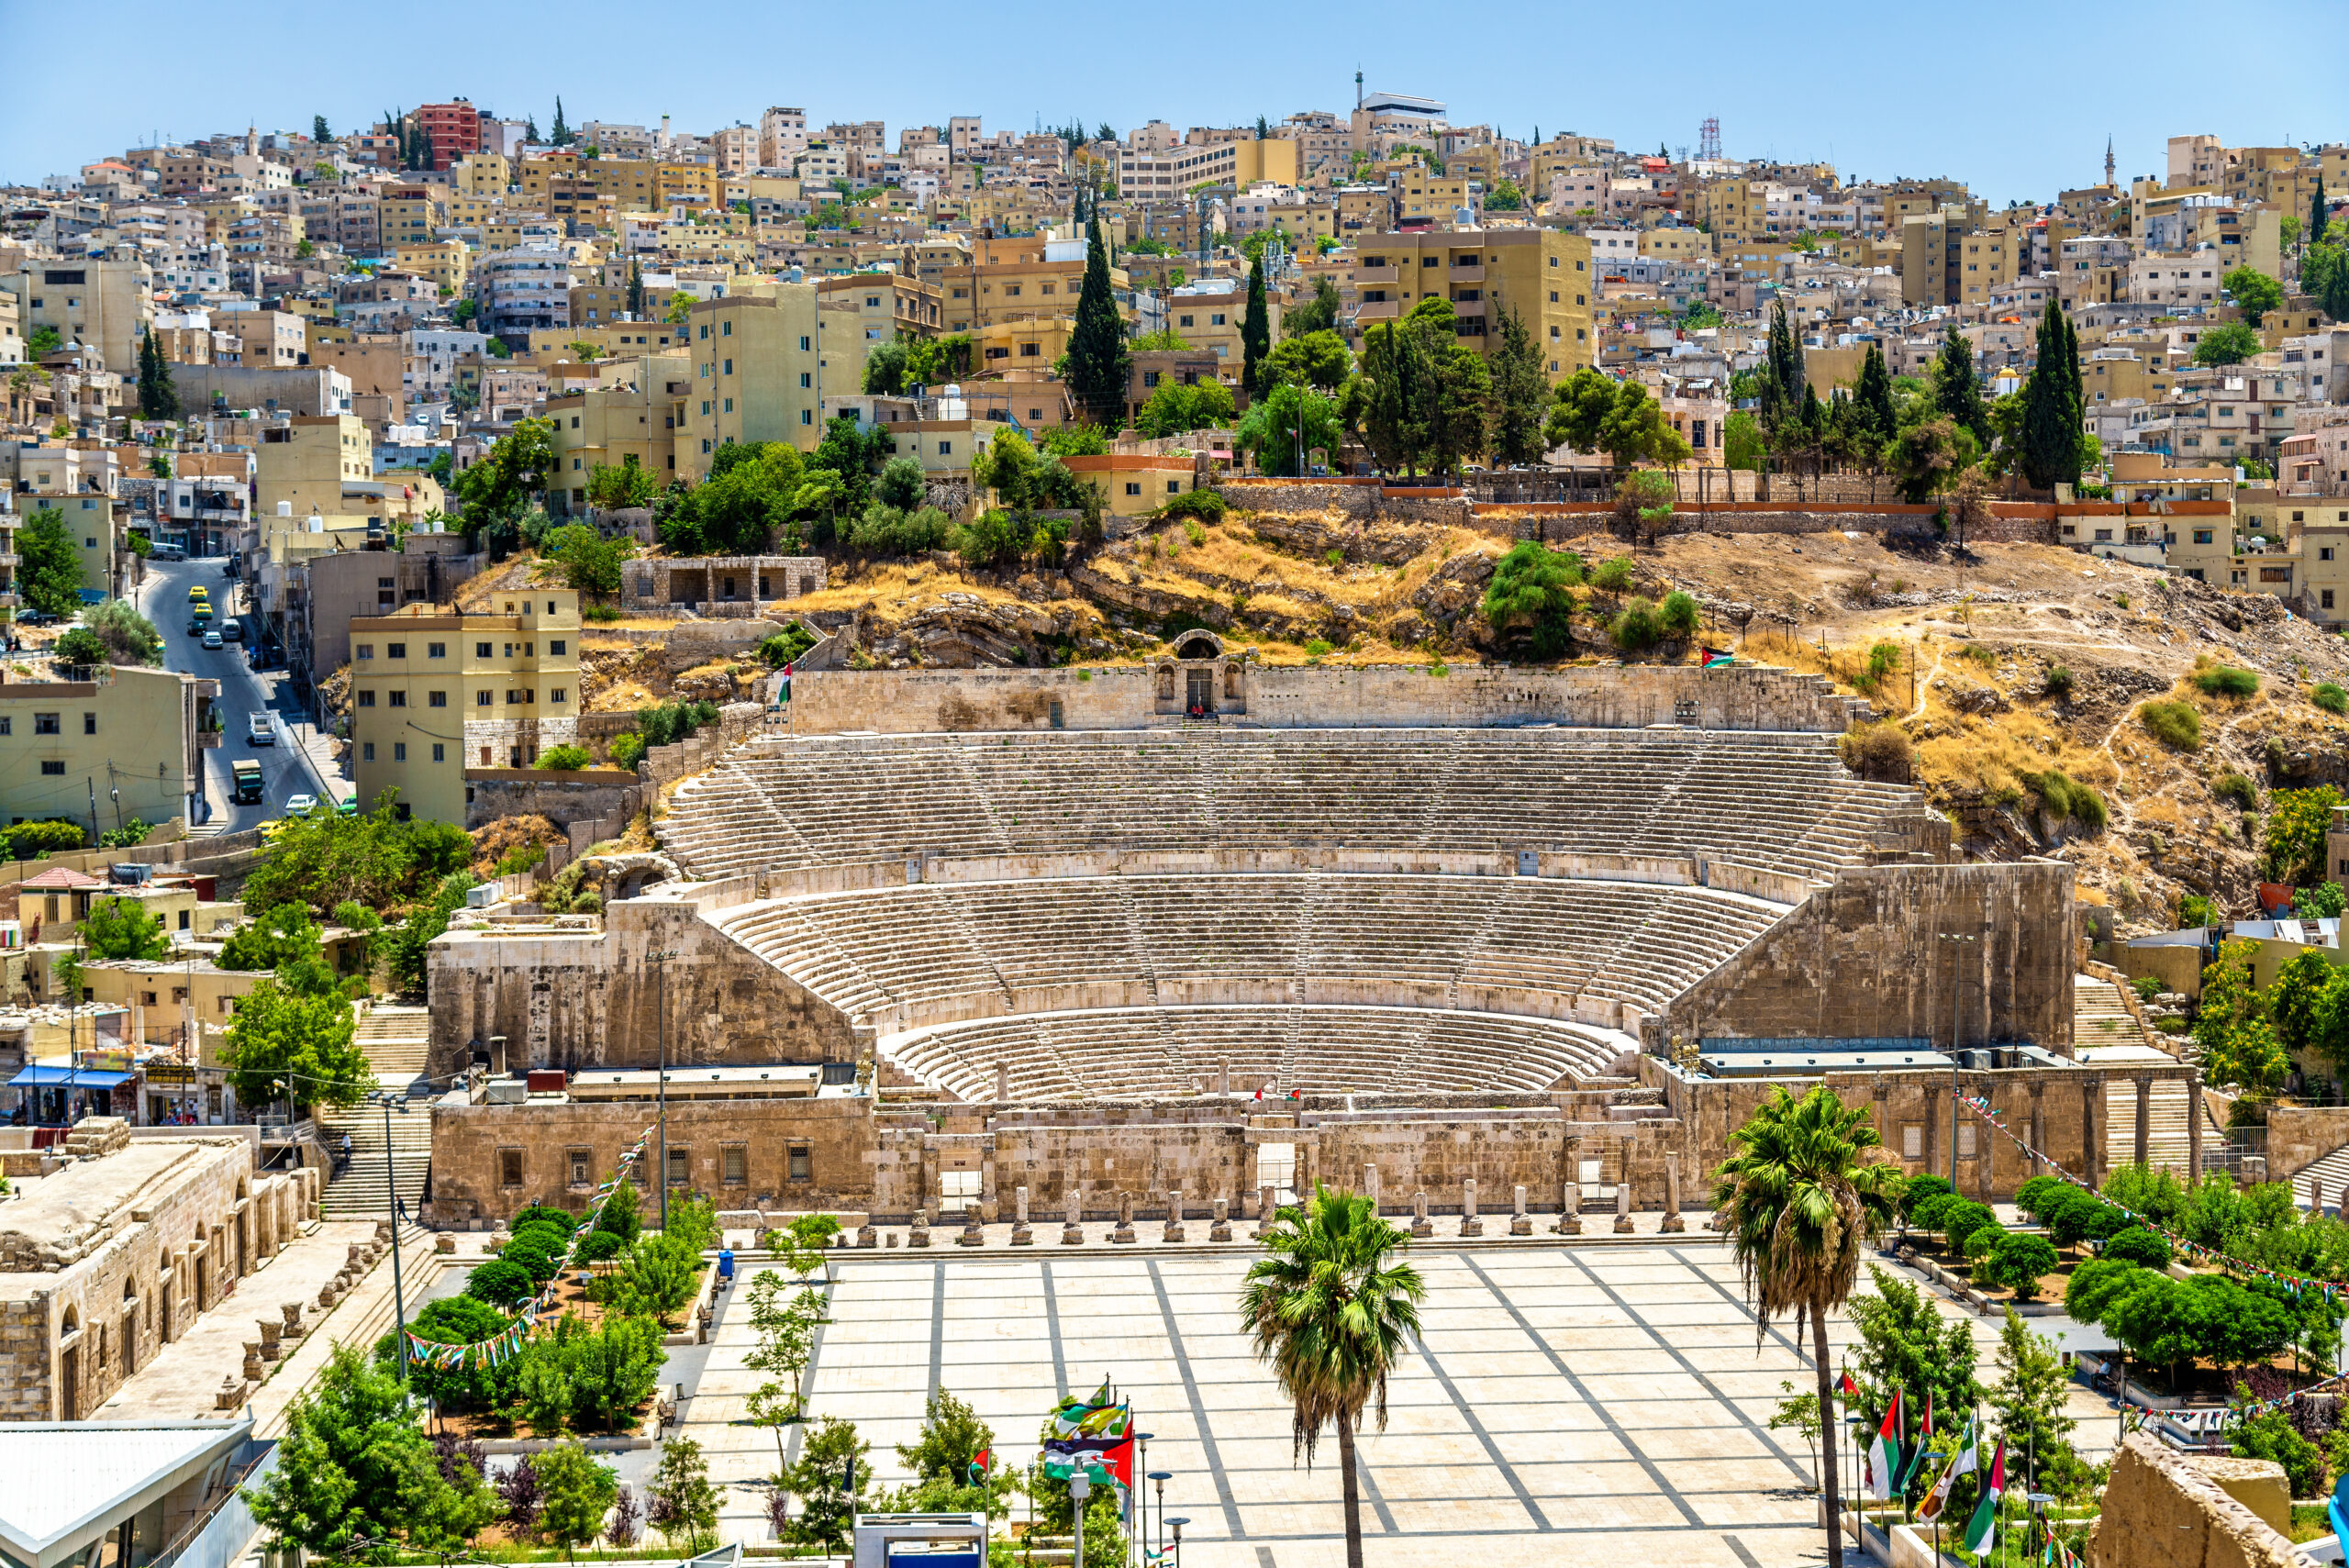 Roman Amphitheater in Downtown Amman